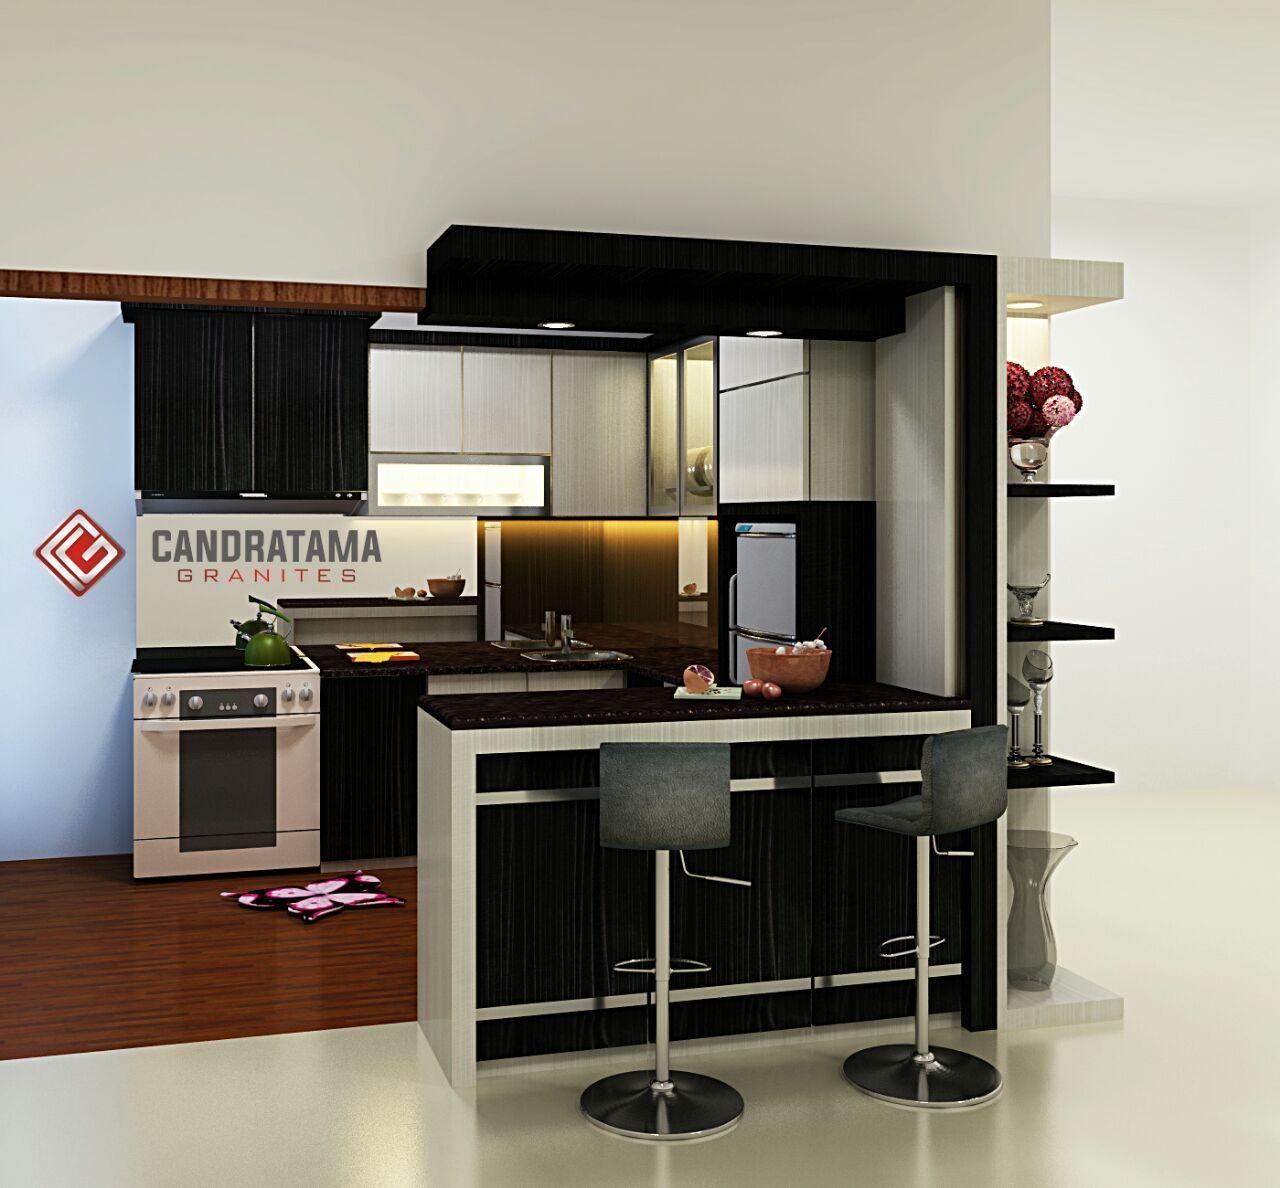 interior kitchen set model mini bar   Rumah, Bar mini, Interior rumah